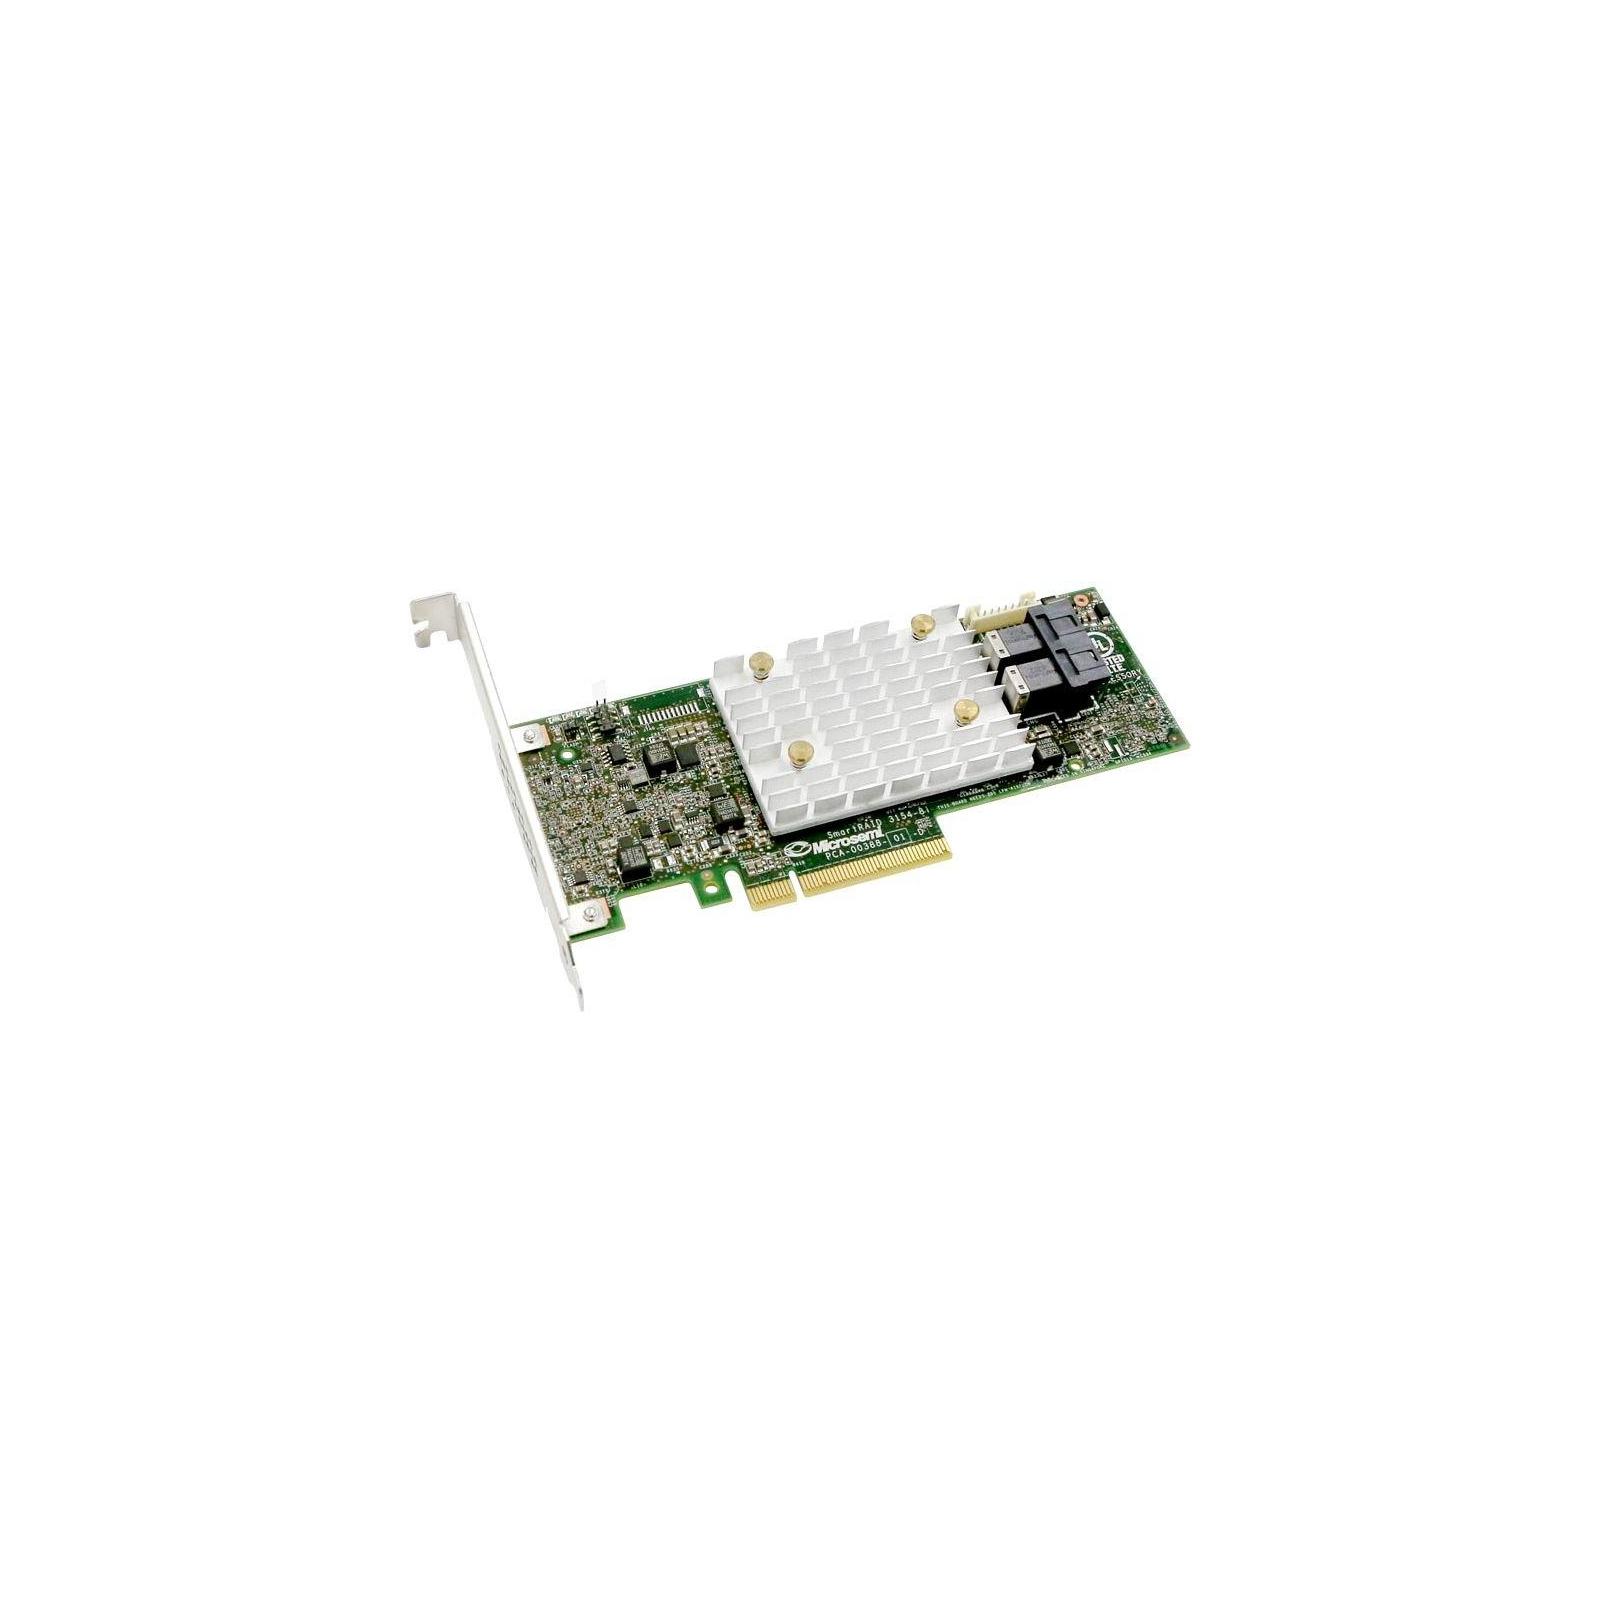 Контроллер RAID Adaptec SmartRAID 3102-8i Single 2xSFF-8643, 8xPCIe 2GB (1222294800-R/22294800-R)